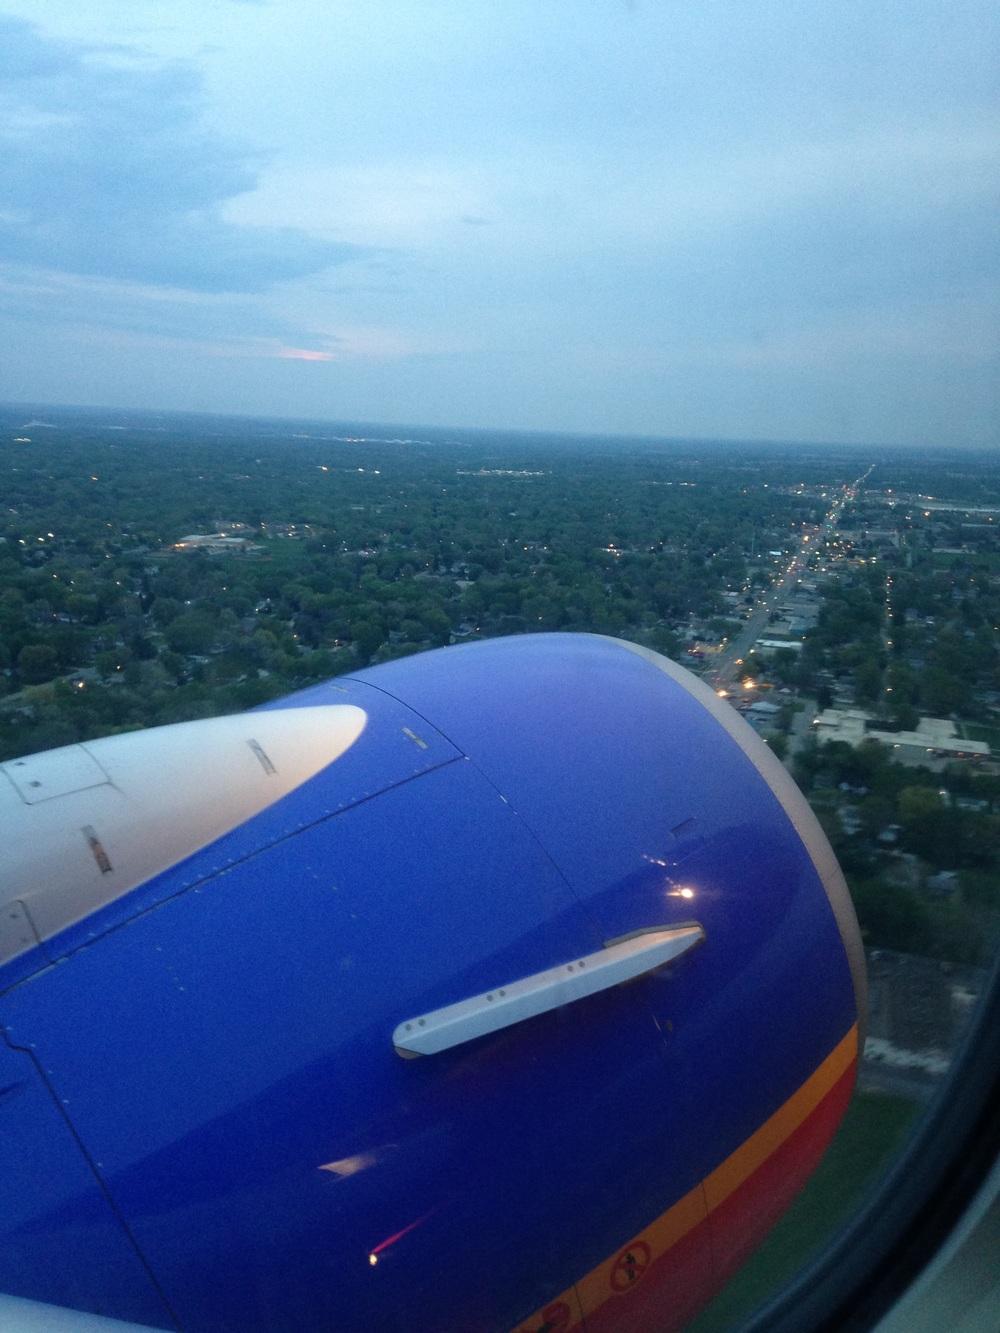 Plane-Lights.jpg